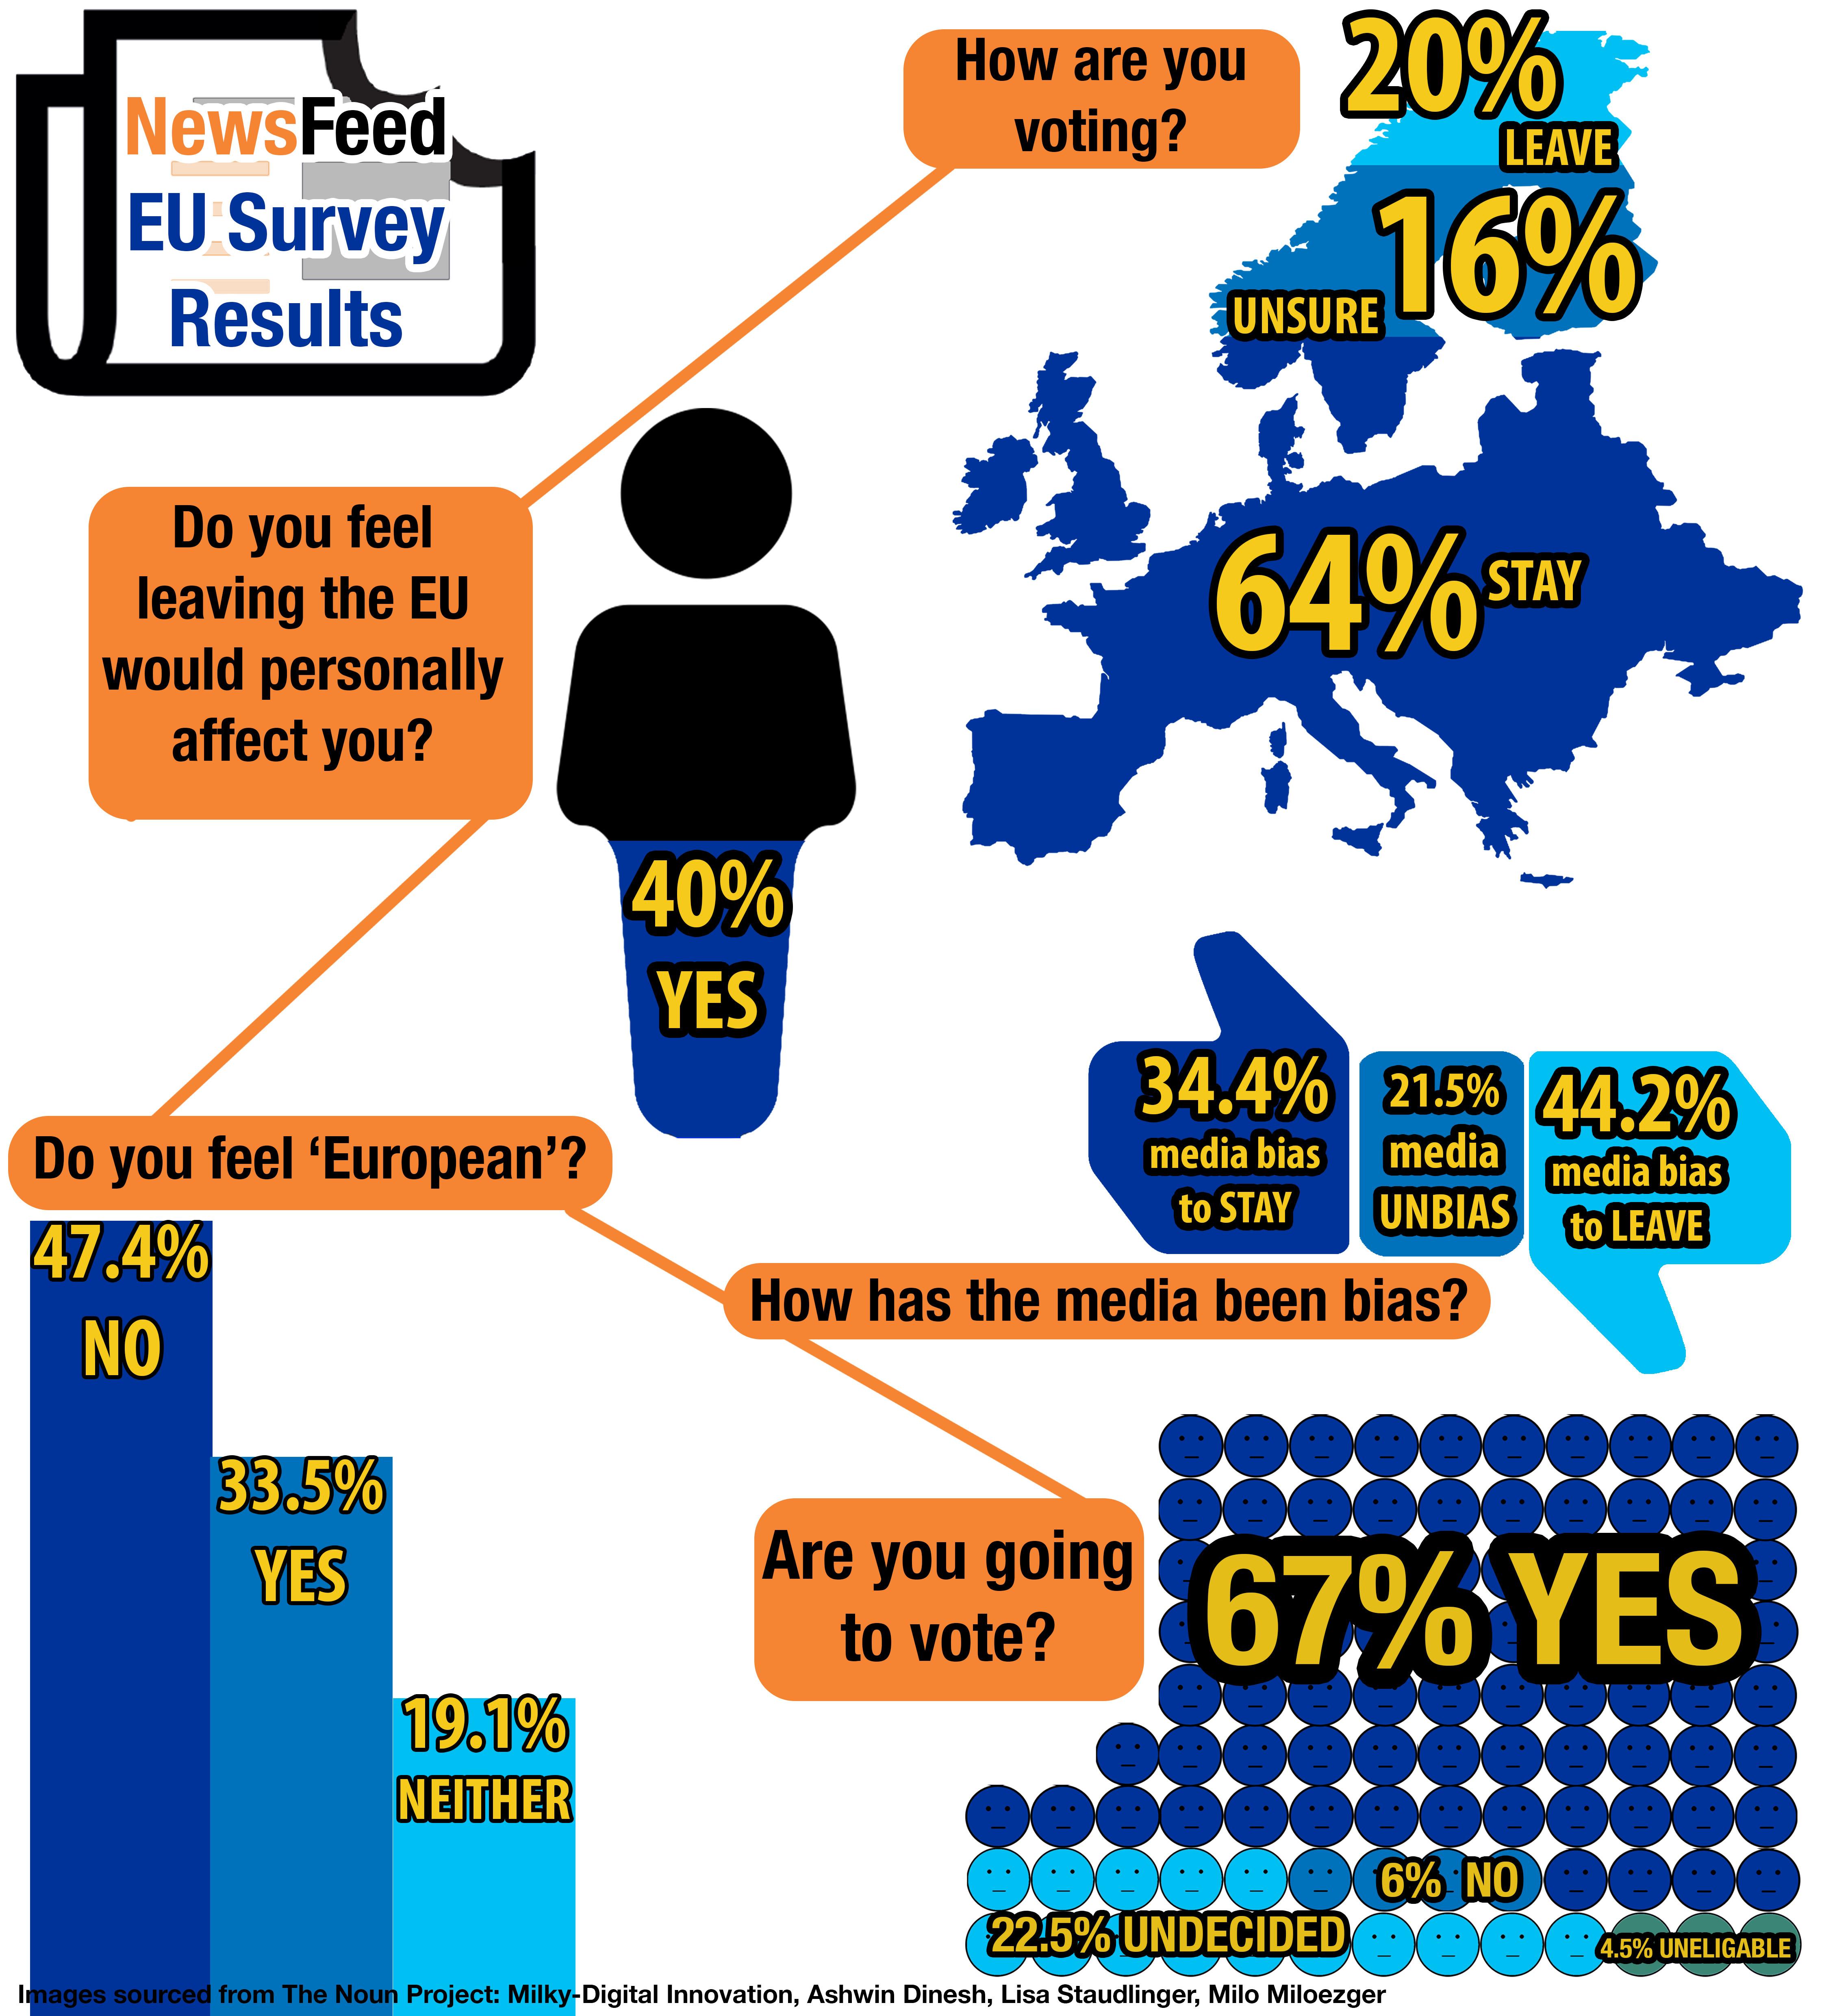 NewsFeed's EU Survey results